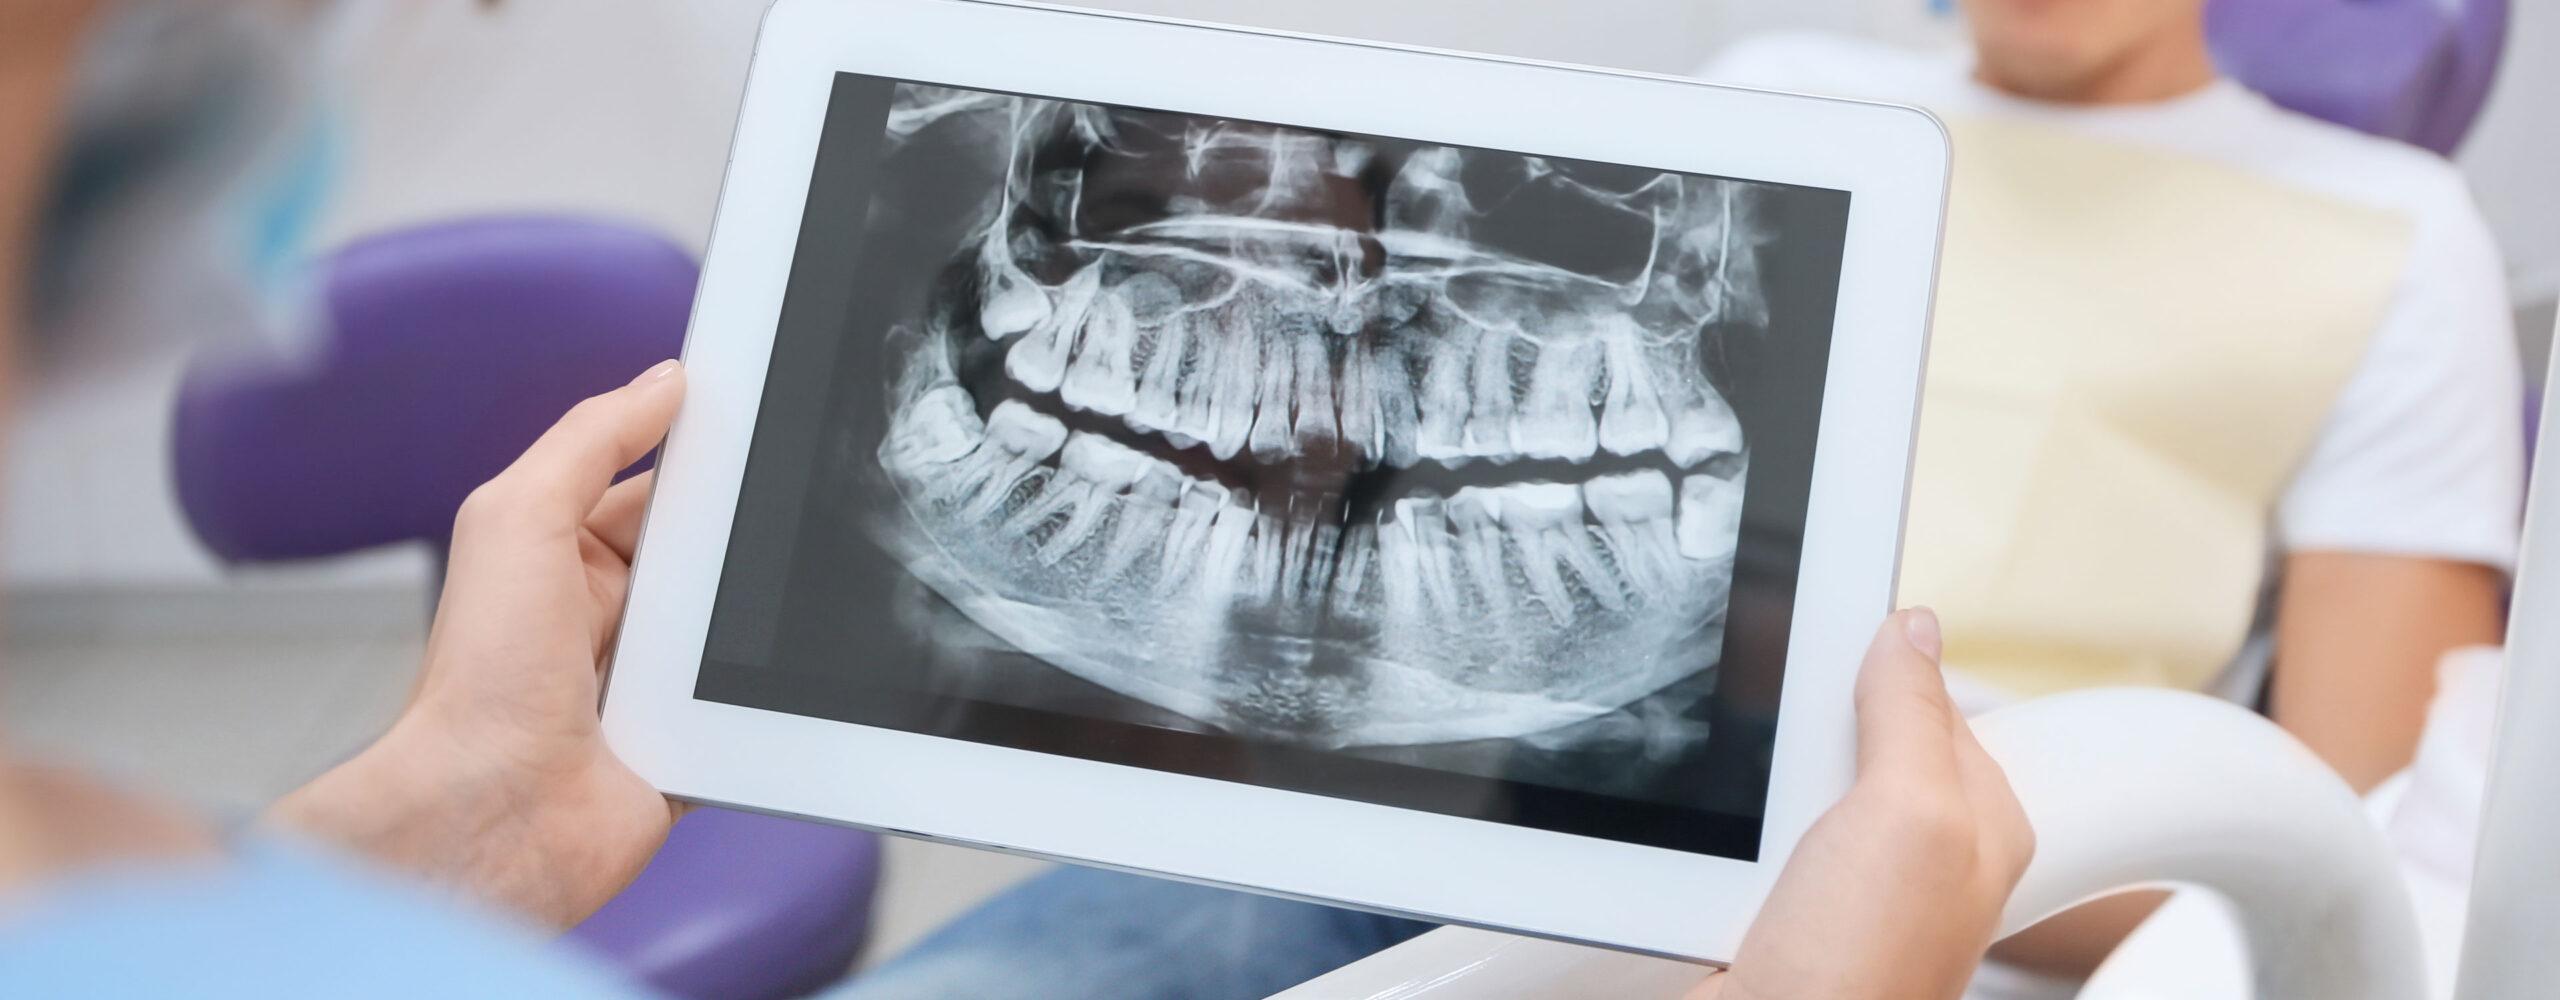 Radiologia Centro Dentale Parmense | Dentisti in Parma